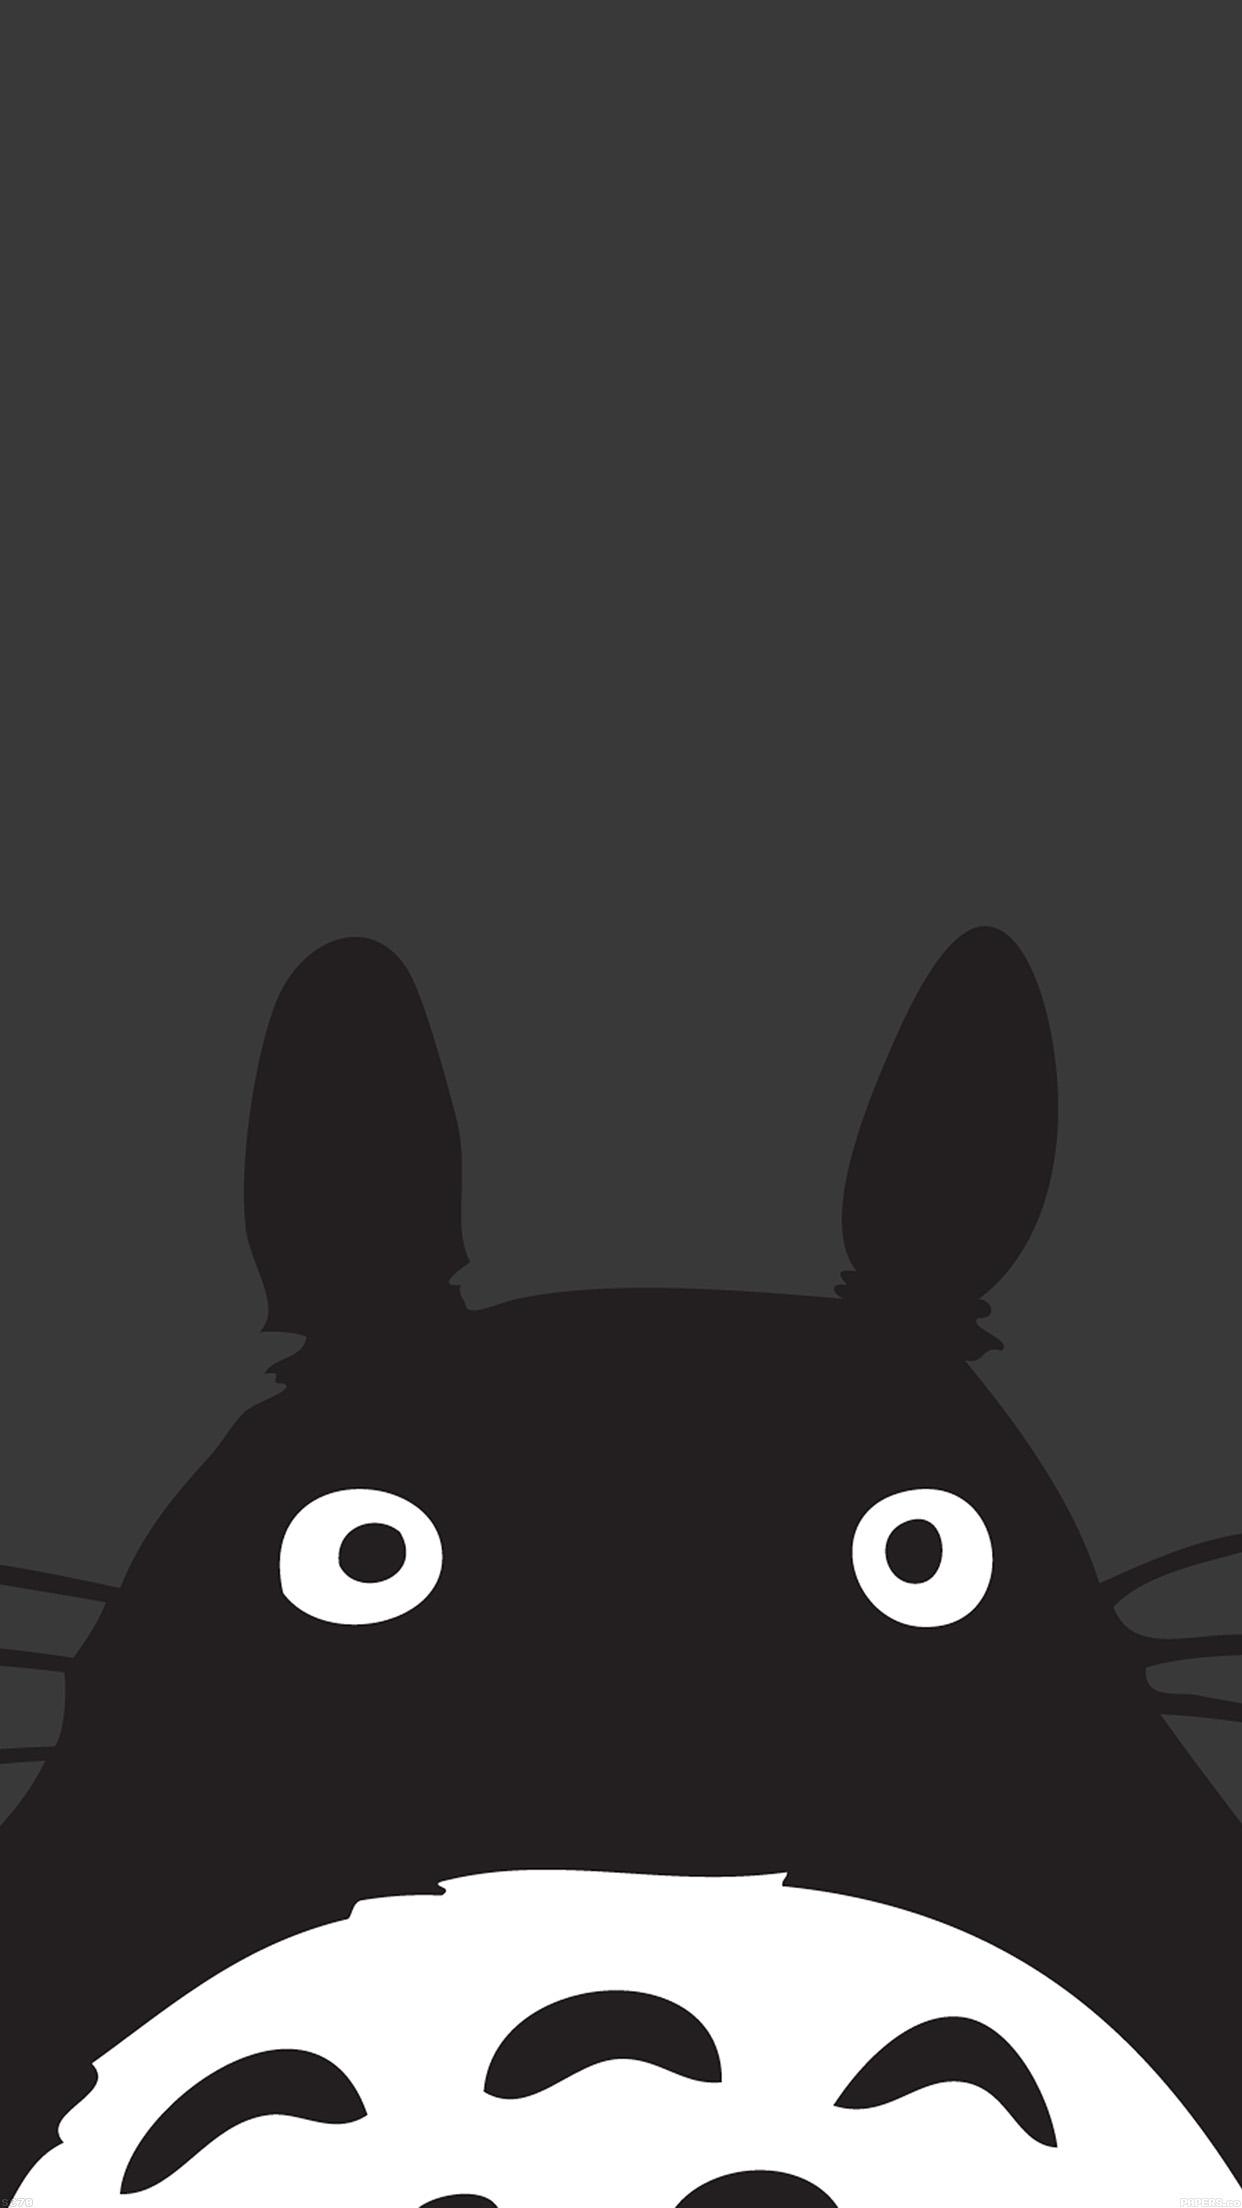 Papers Co Iphone Wallpaper Af44 Totoro Minimal Art